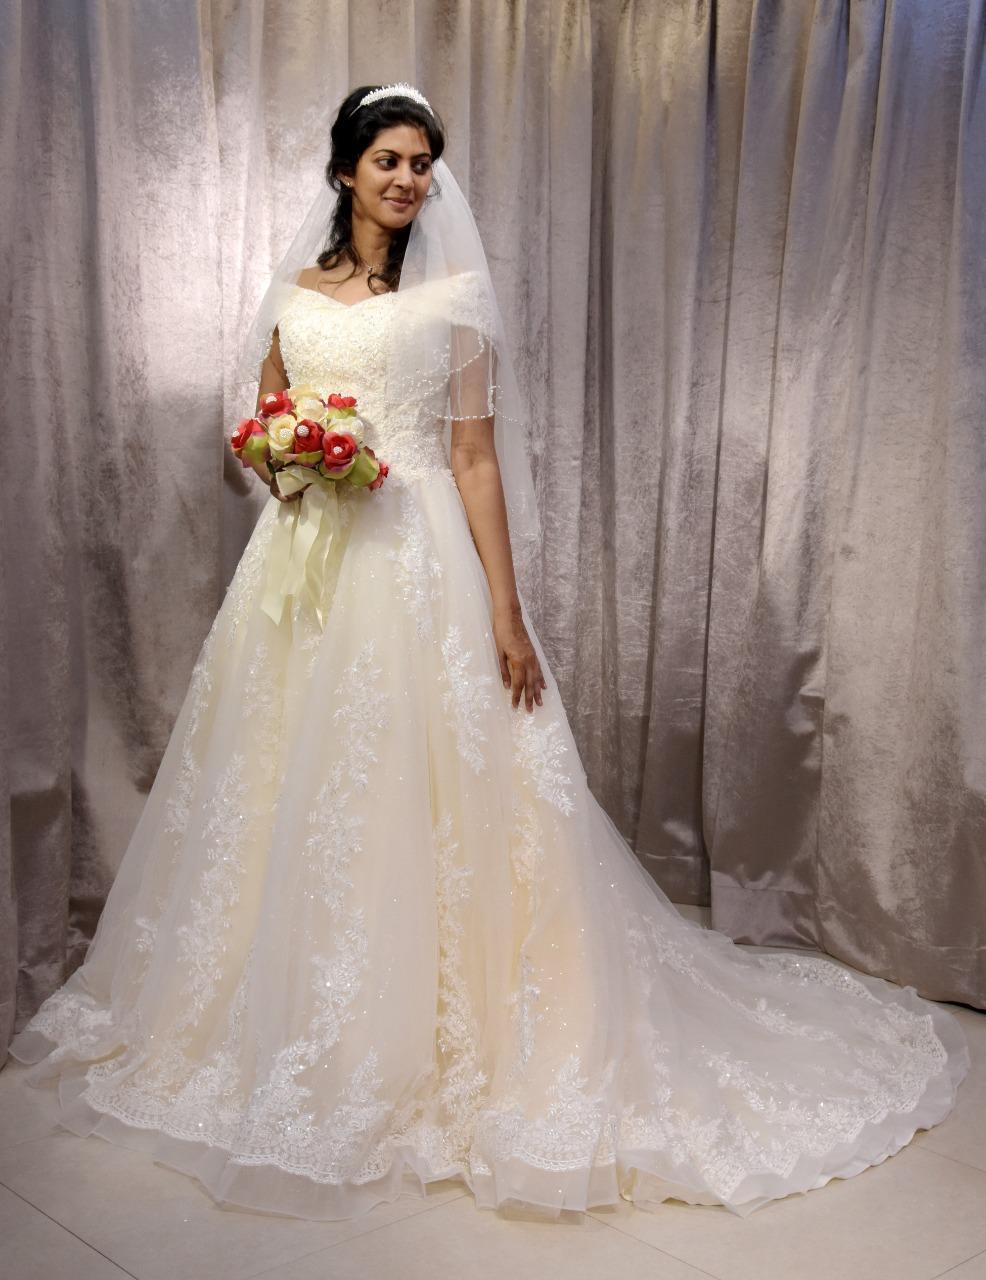 Christian Bridal Dresses